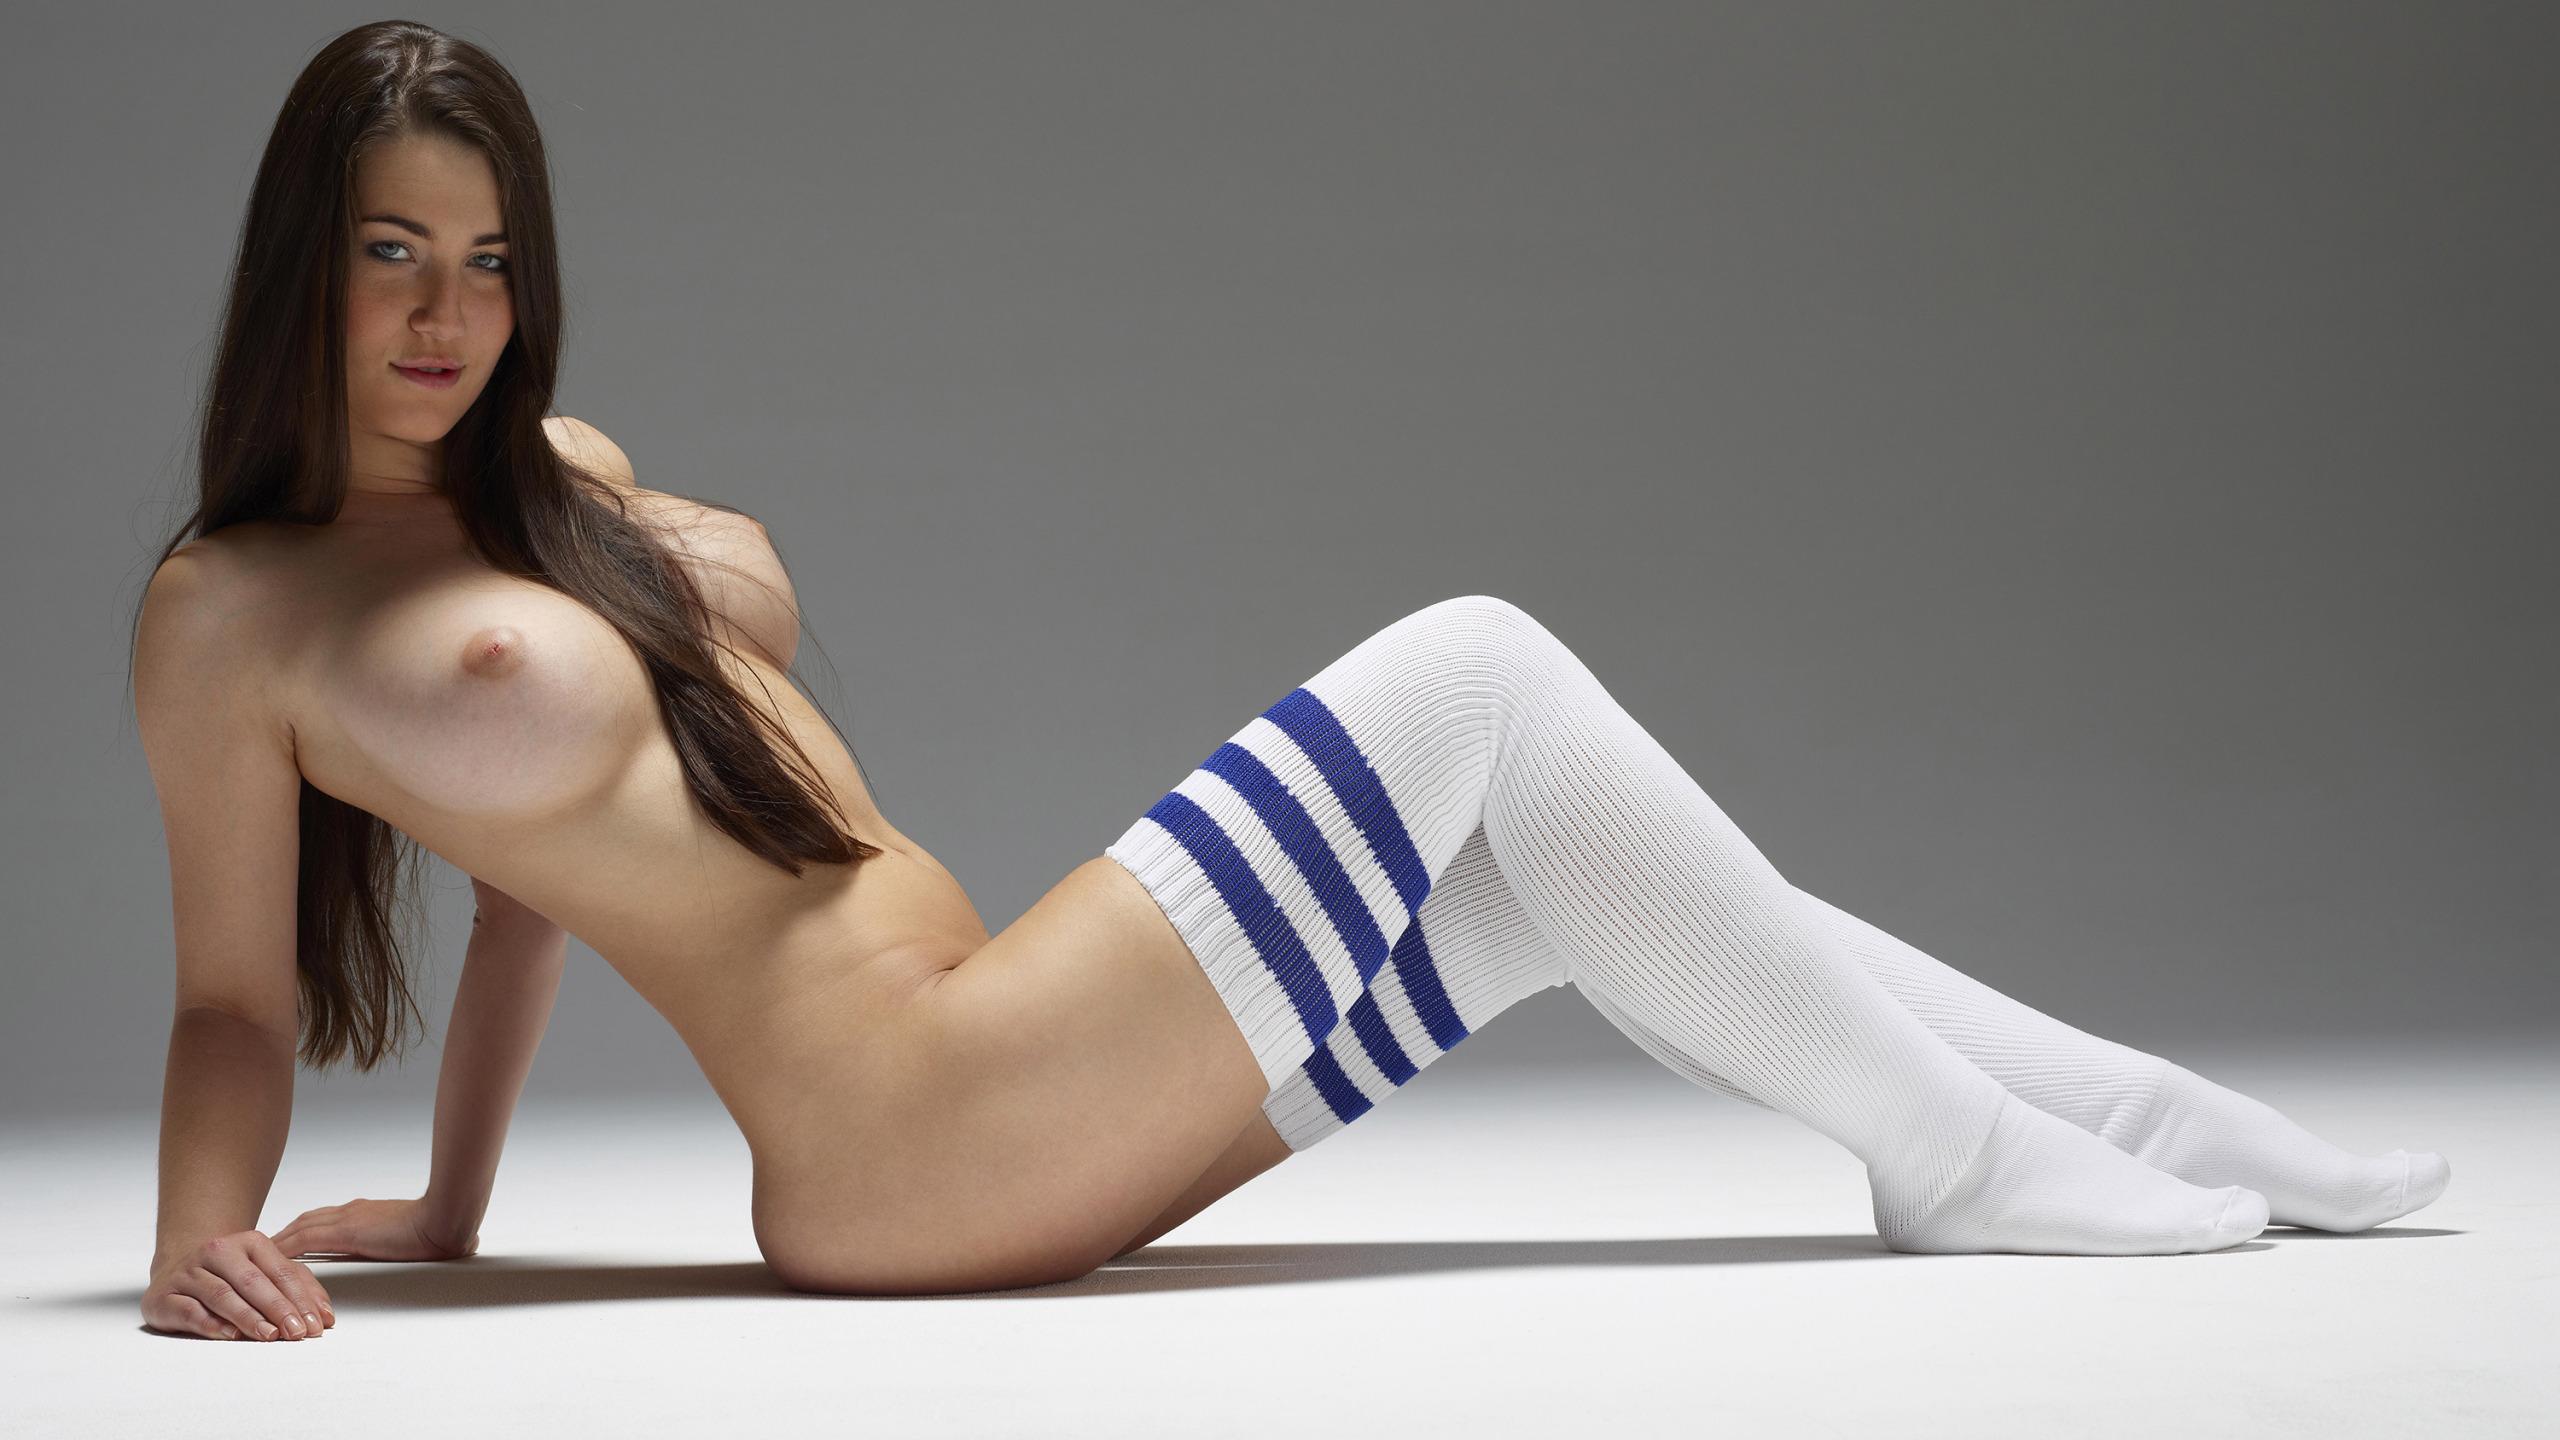 Female girl with knee high socks nude